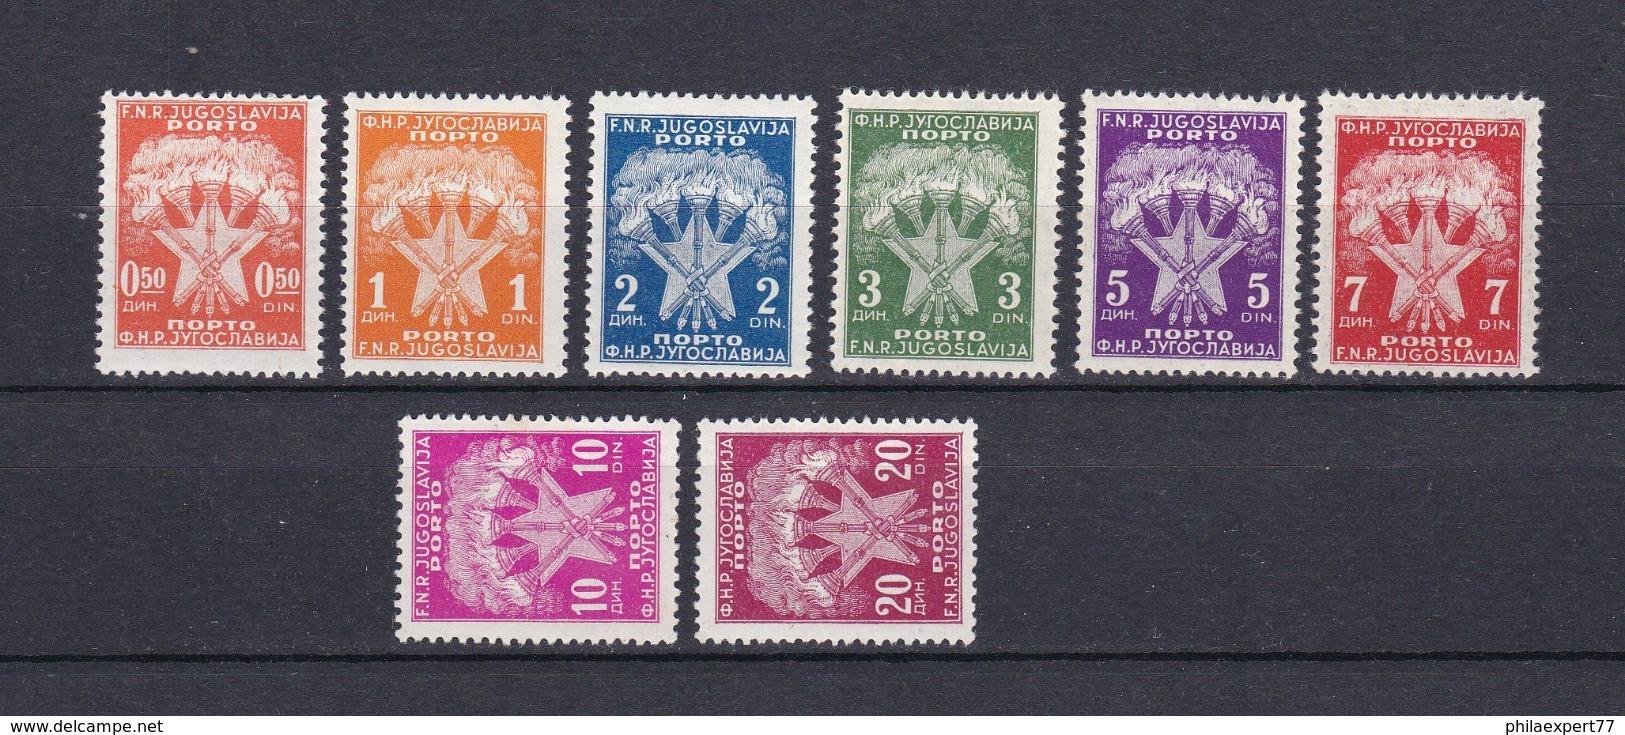 Jugoslawien - Portomarken - 1946 - Michel Nr. 89/96 - Postfrisch - 1945-1992 Sozialistische Föderative Republik Jugoslawien